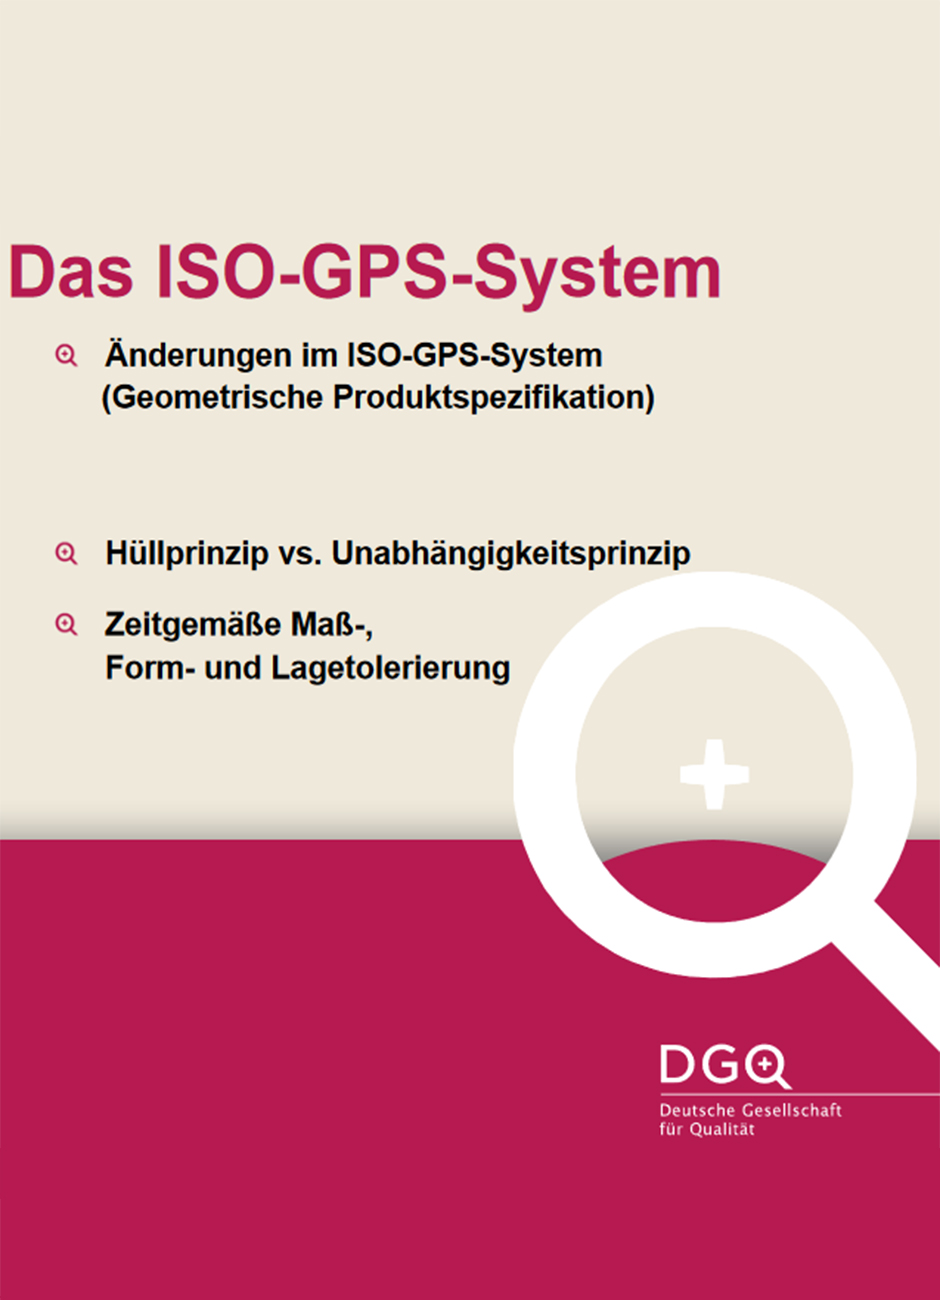 DGQ-Infografik: Überblick zum ISO-GPS-System